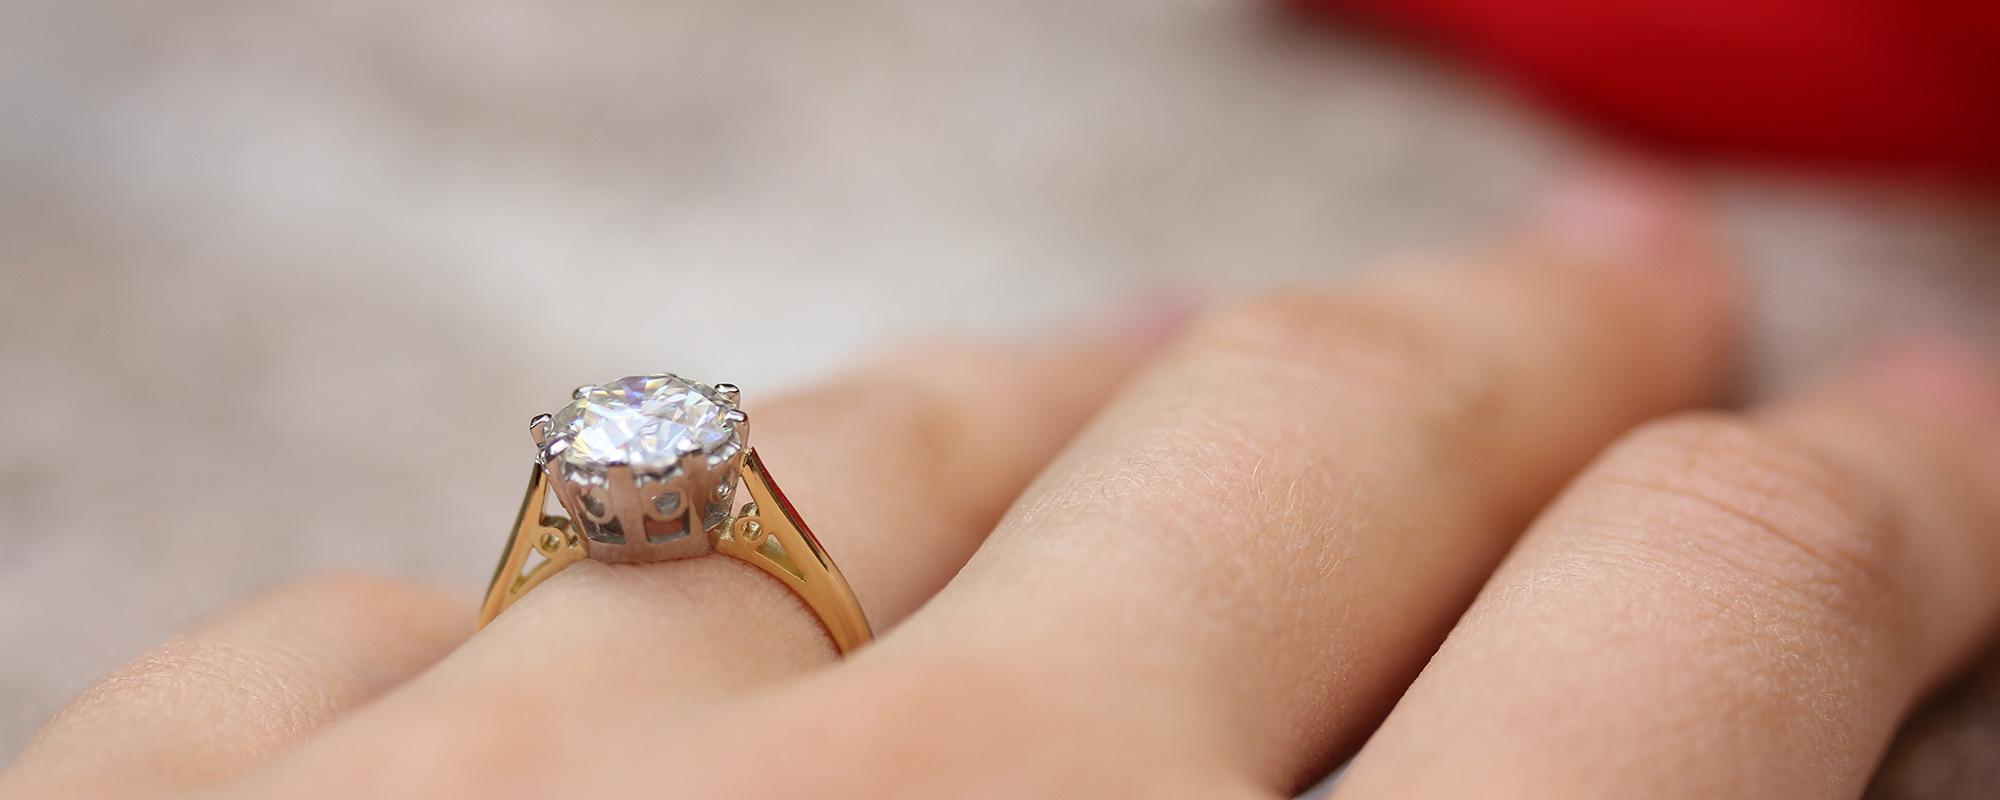 Choosing The Perfect Diamond - Cut Clarity Colour Diamonds | Ethica UK